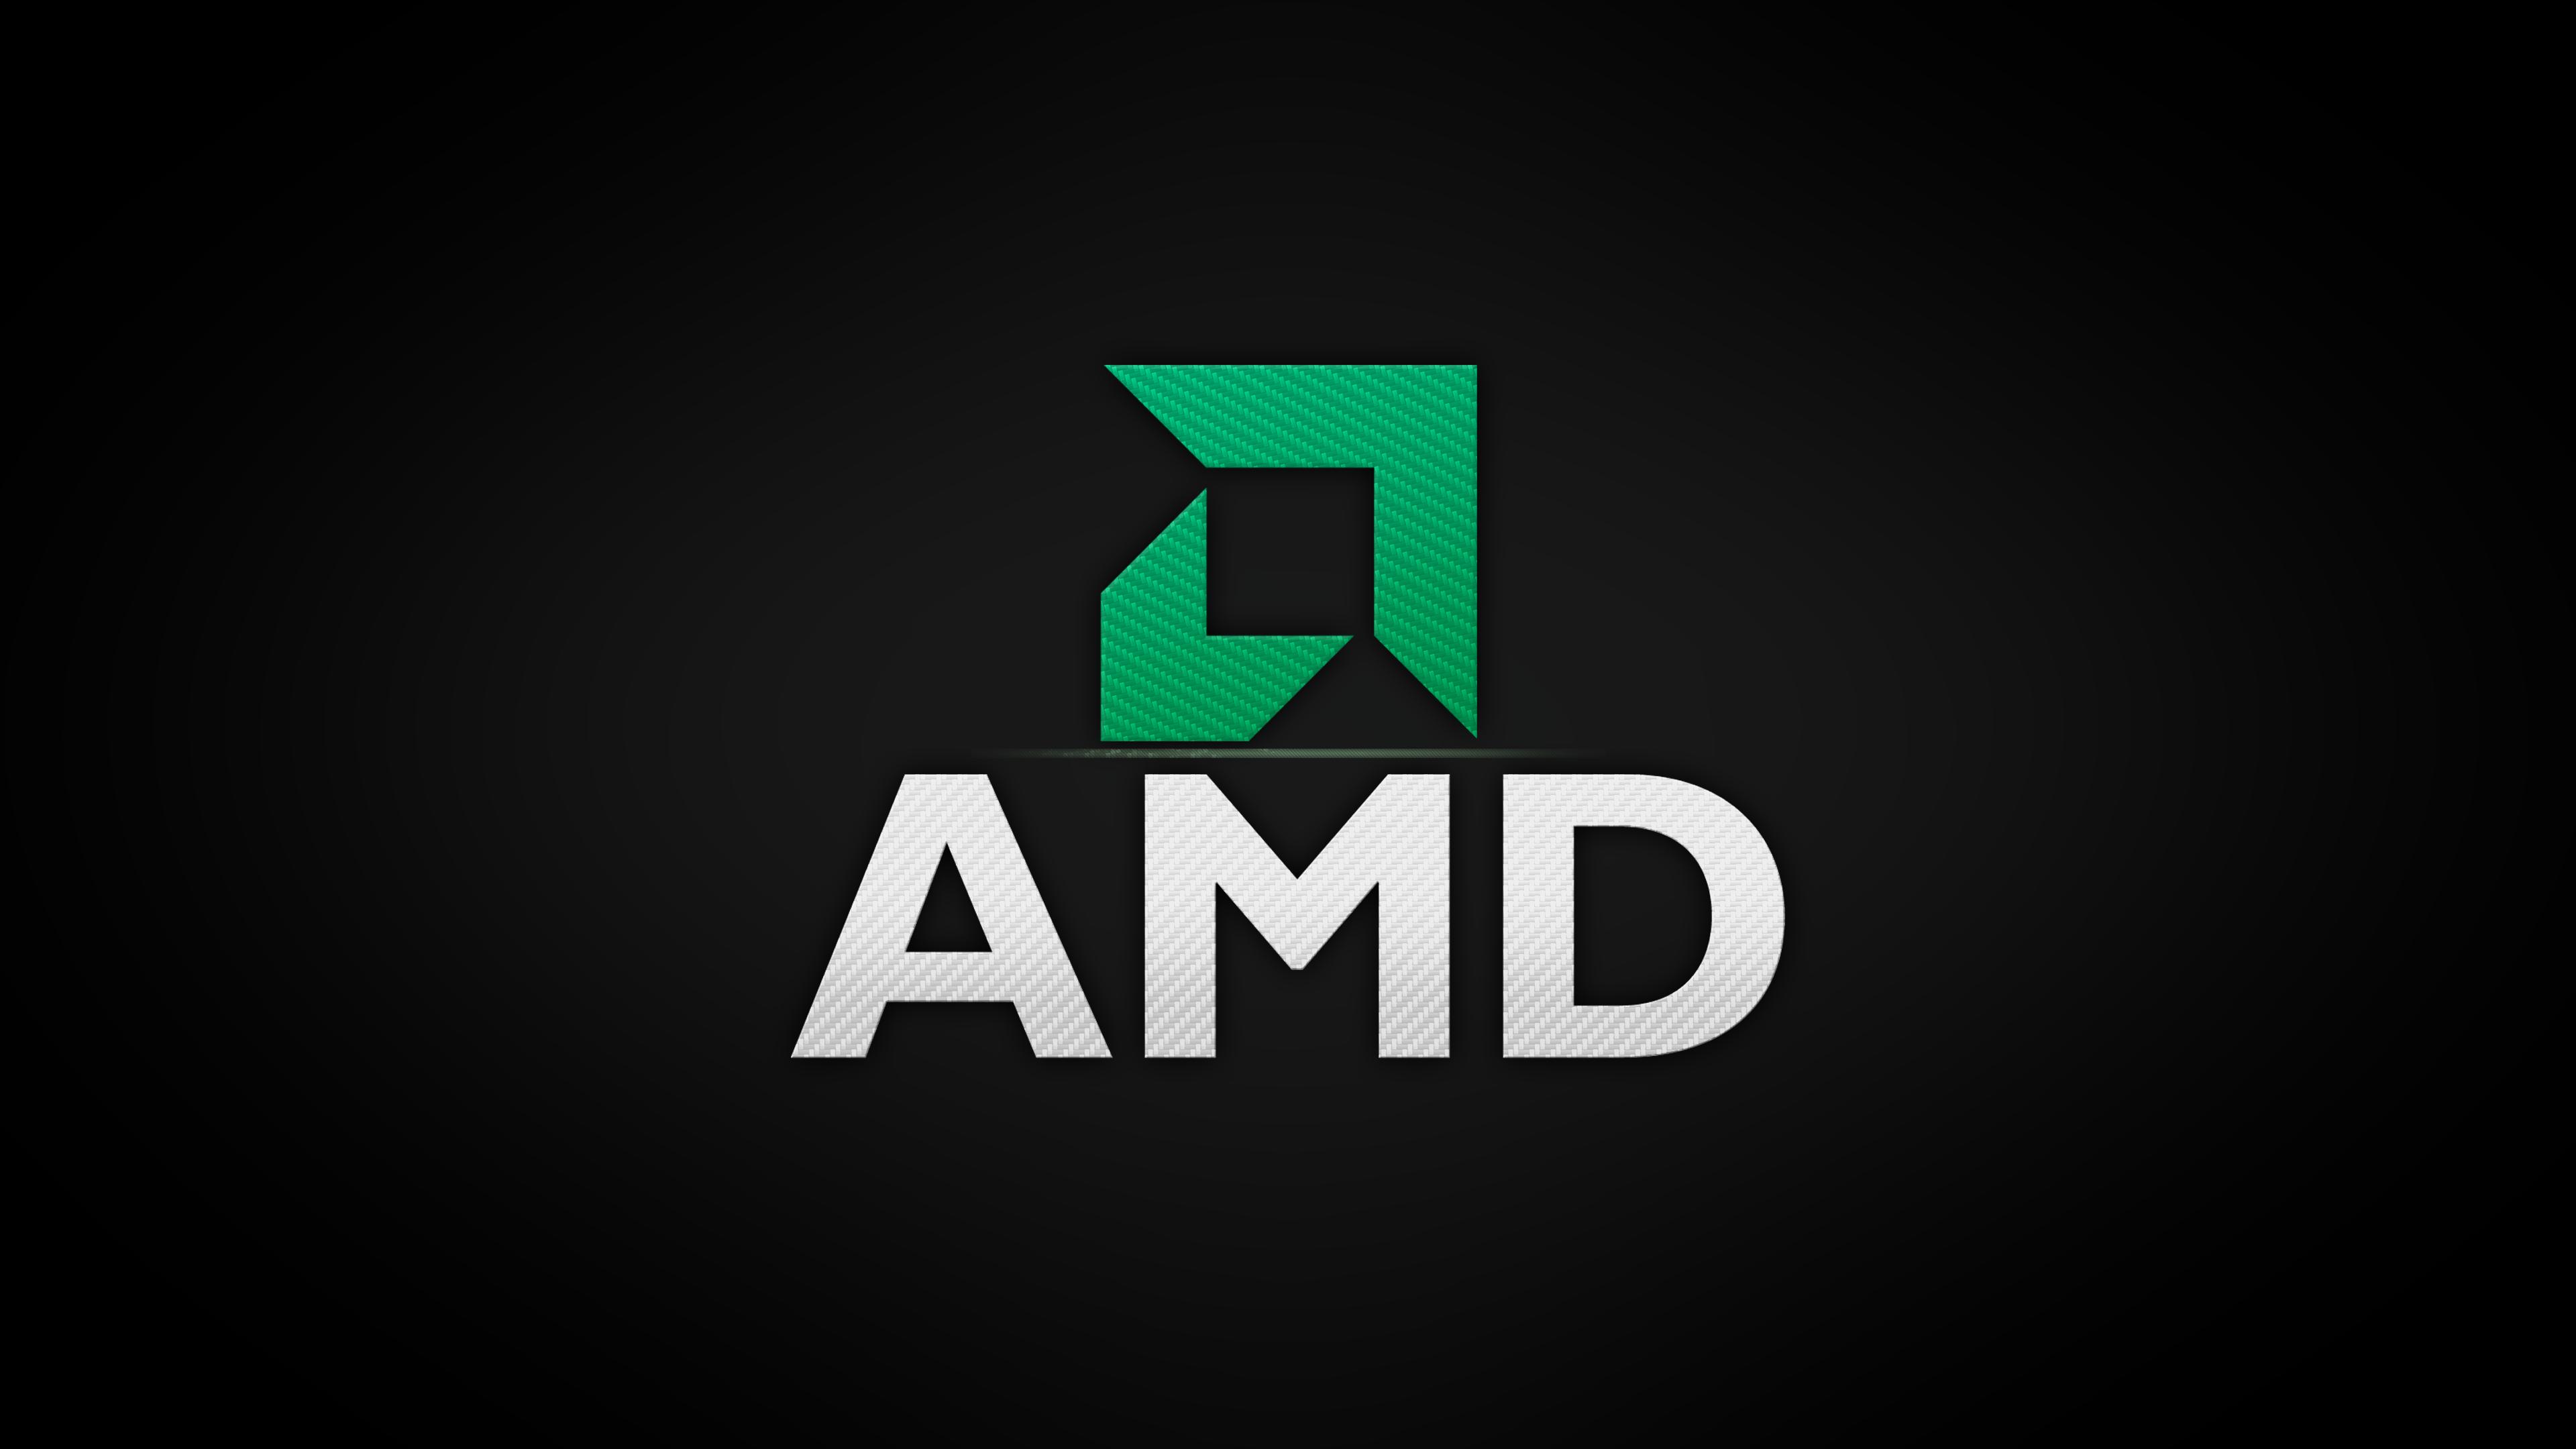 Amd Brand Logo Wallpaper | Logo HD Wallpapers